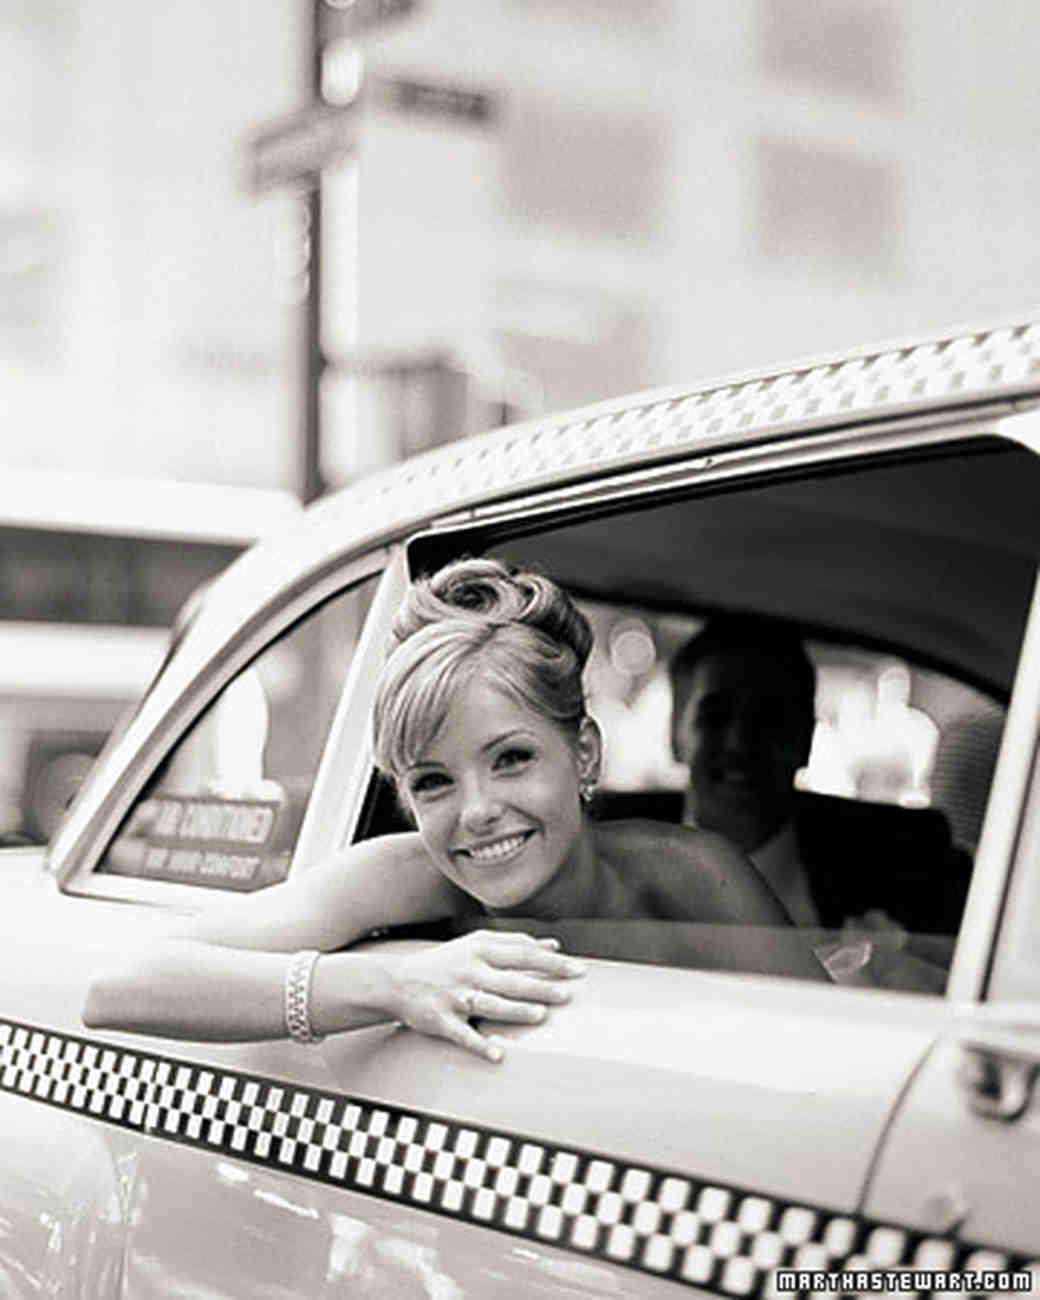 mwa103587_wi08_taxi.jpg